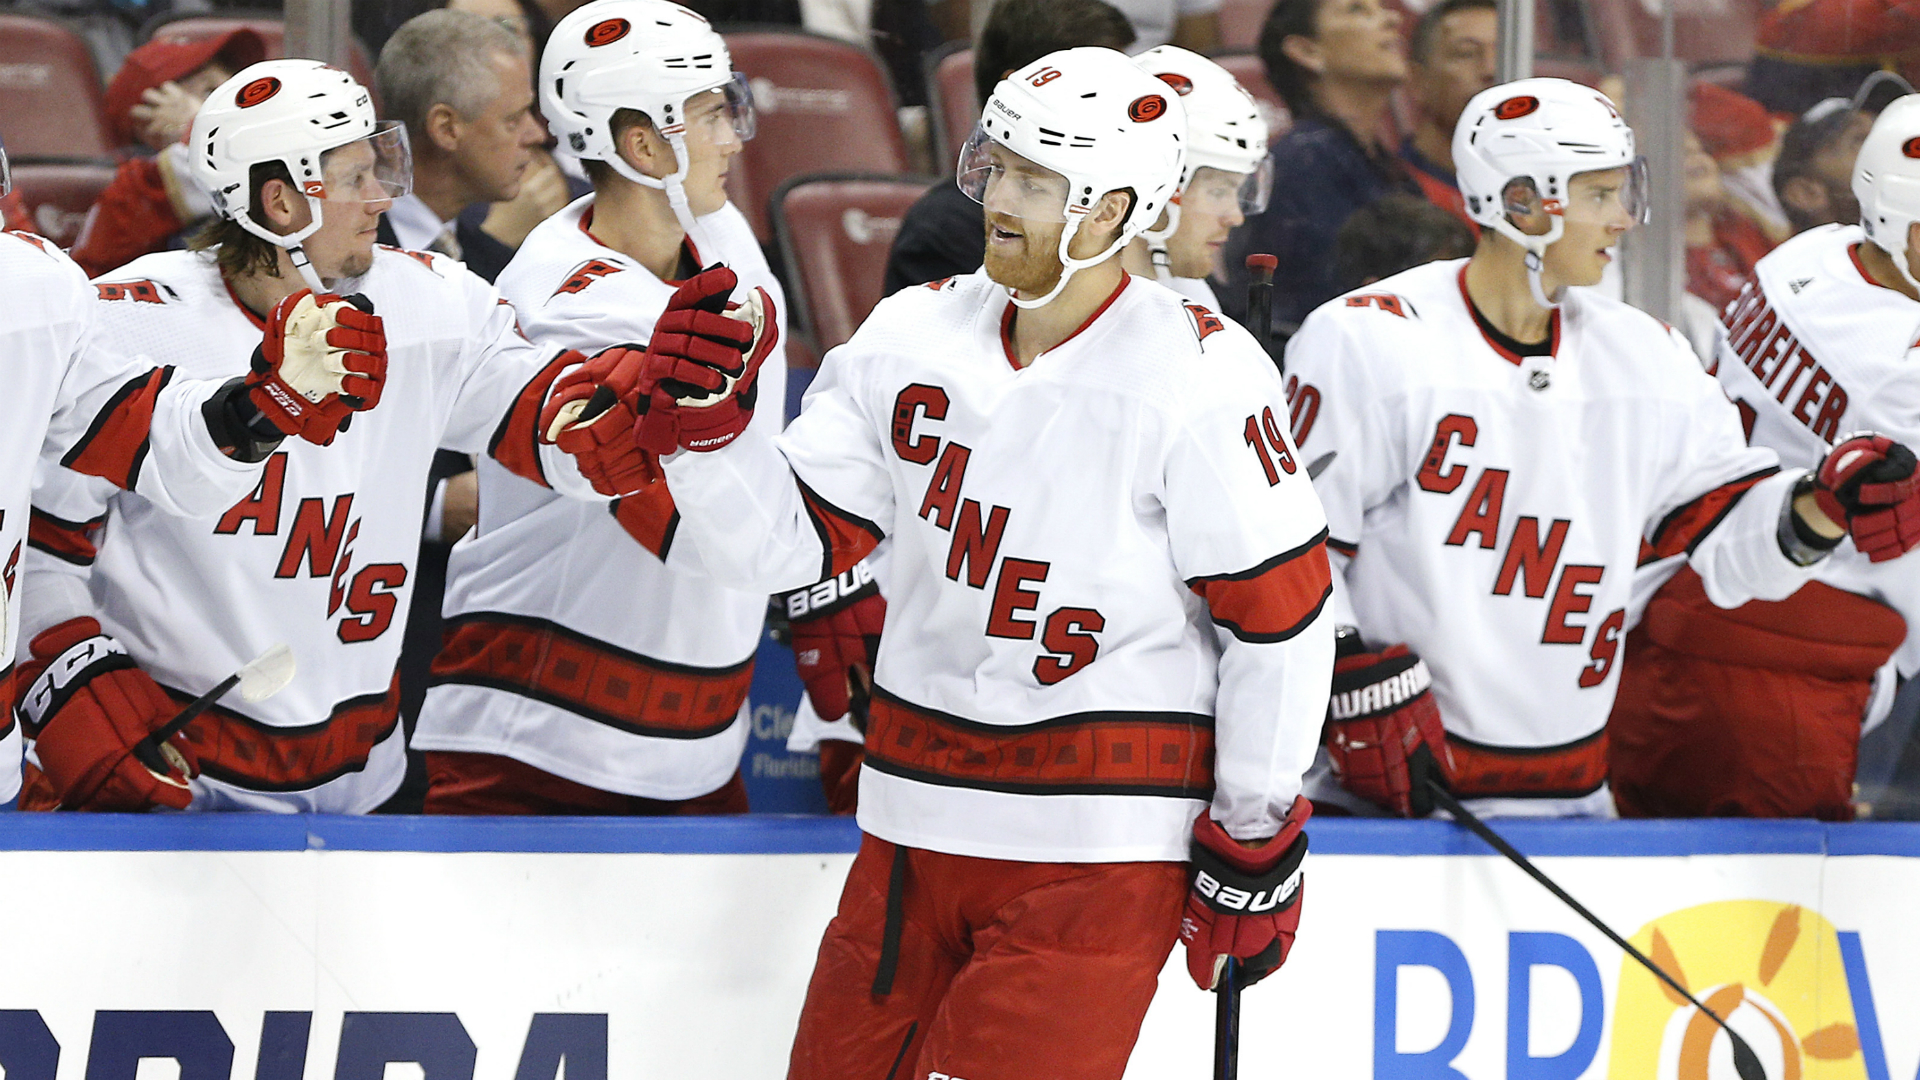 Edmonton Oilers surrender surprising center ice goal vs. Carolina Hurricanes